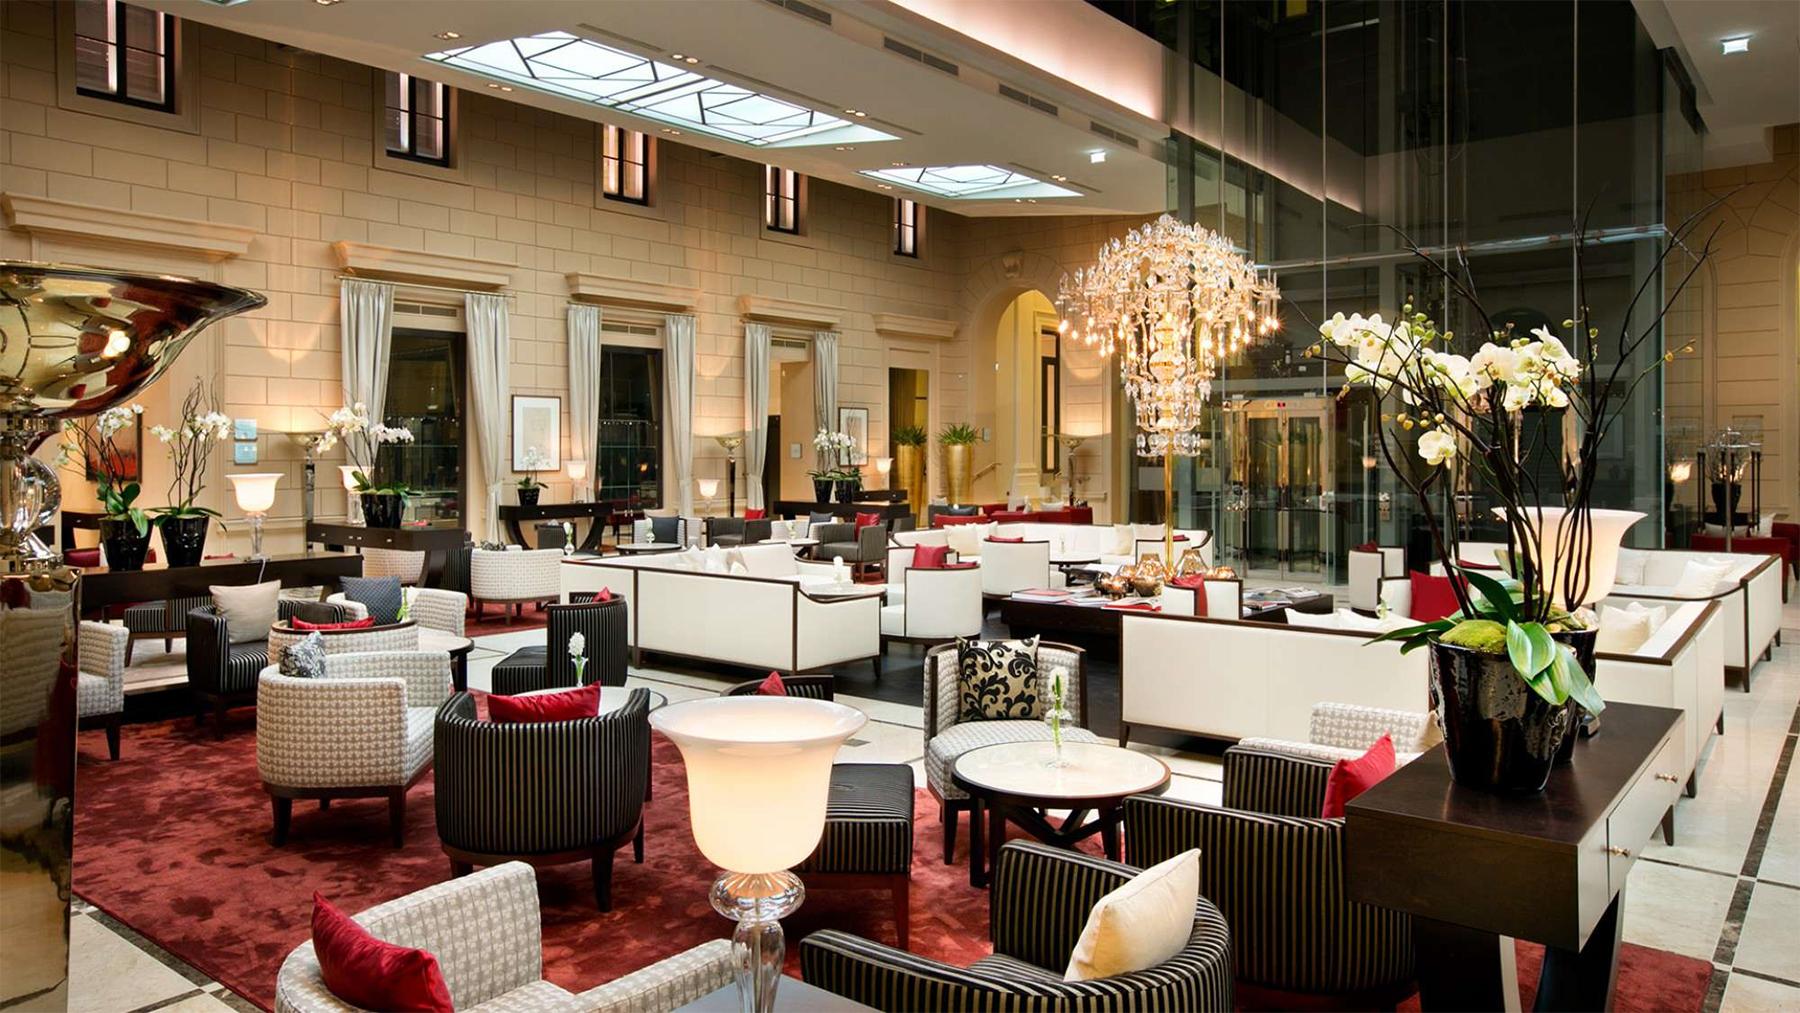 Küchenchef Kempinski Wien ~ kempinski opens palais hansen kempinski hotel vienna